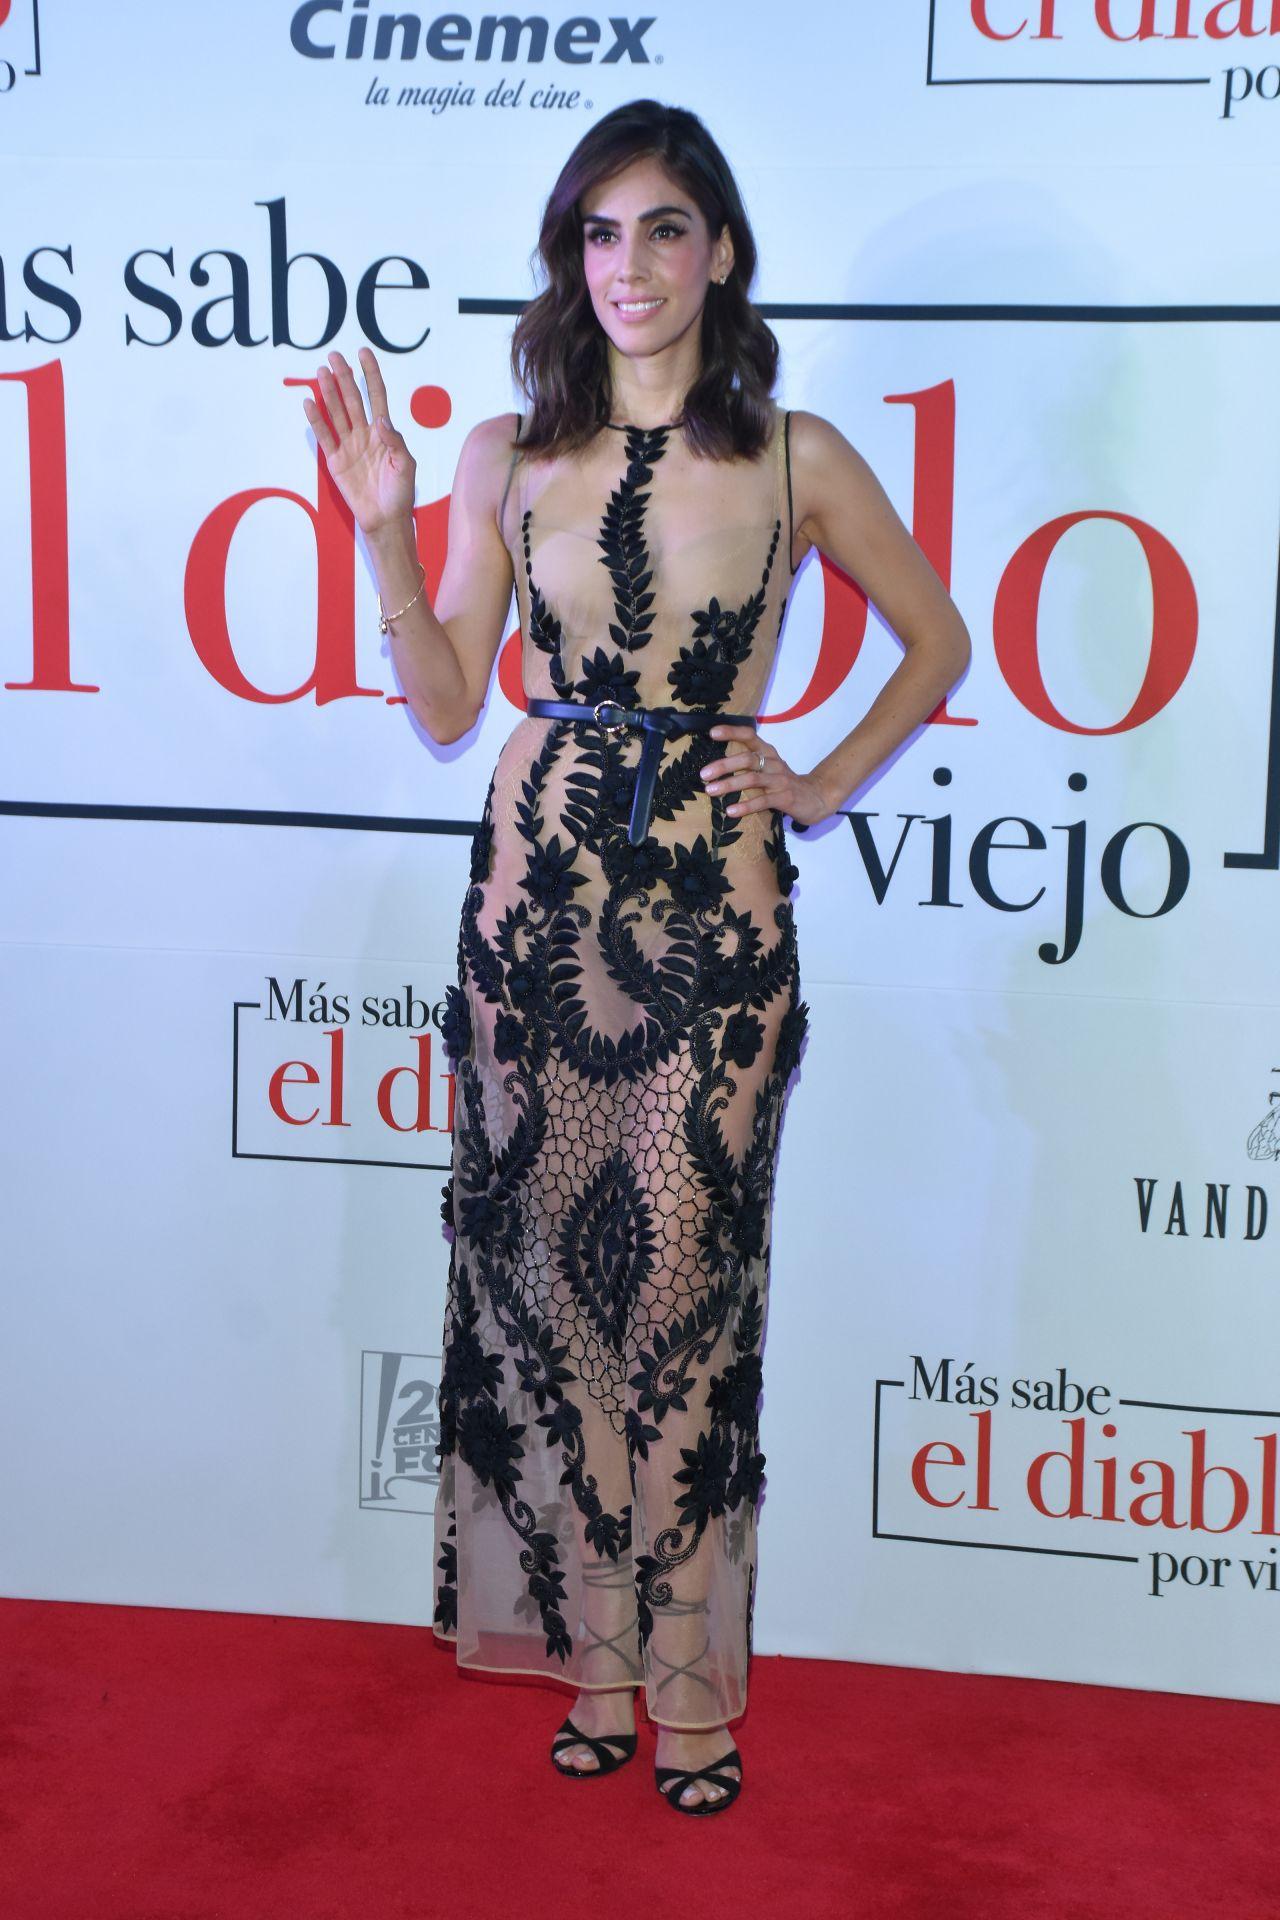 https://celebmafia.com/wp-content/uploads/2018/07/sandra-echeverria-mas-sabe-el-diablo-por-viejo-premiere-in-mexico-city-3.jpg